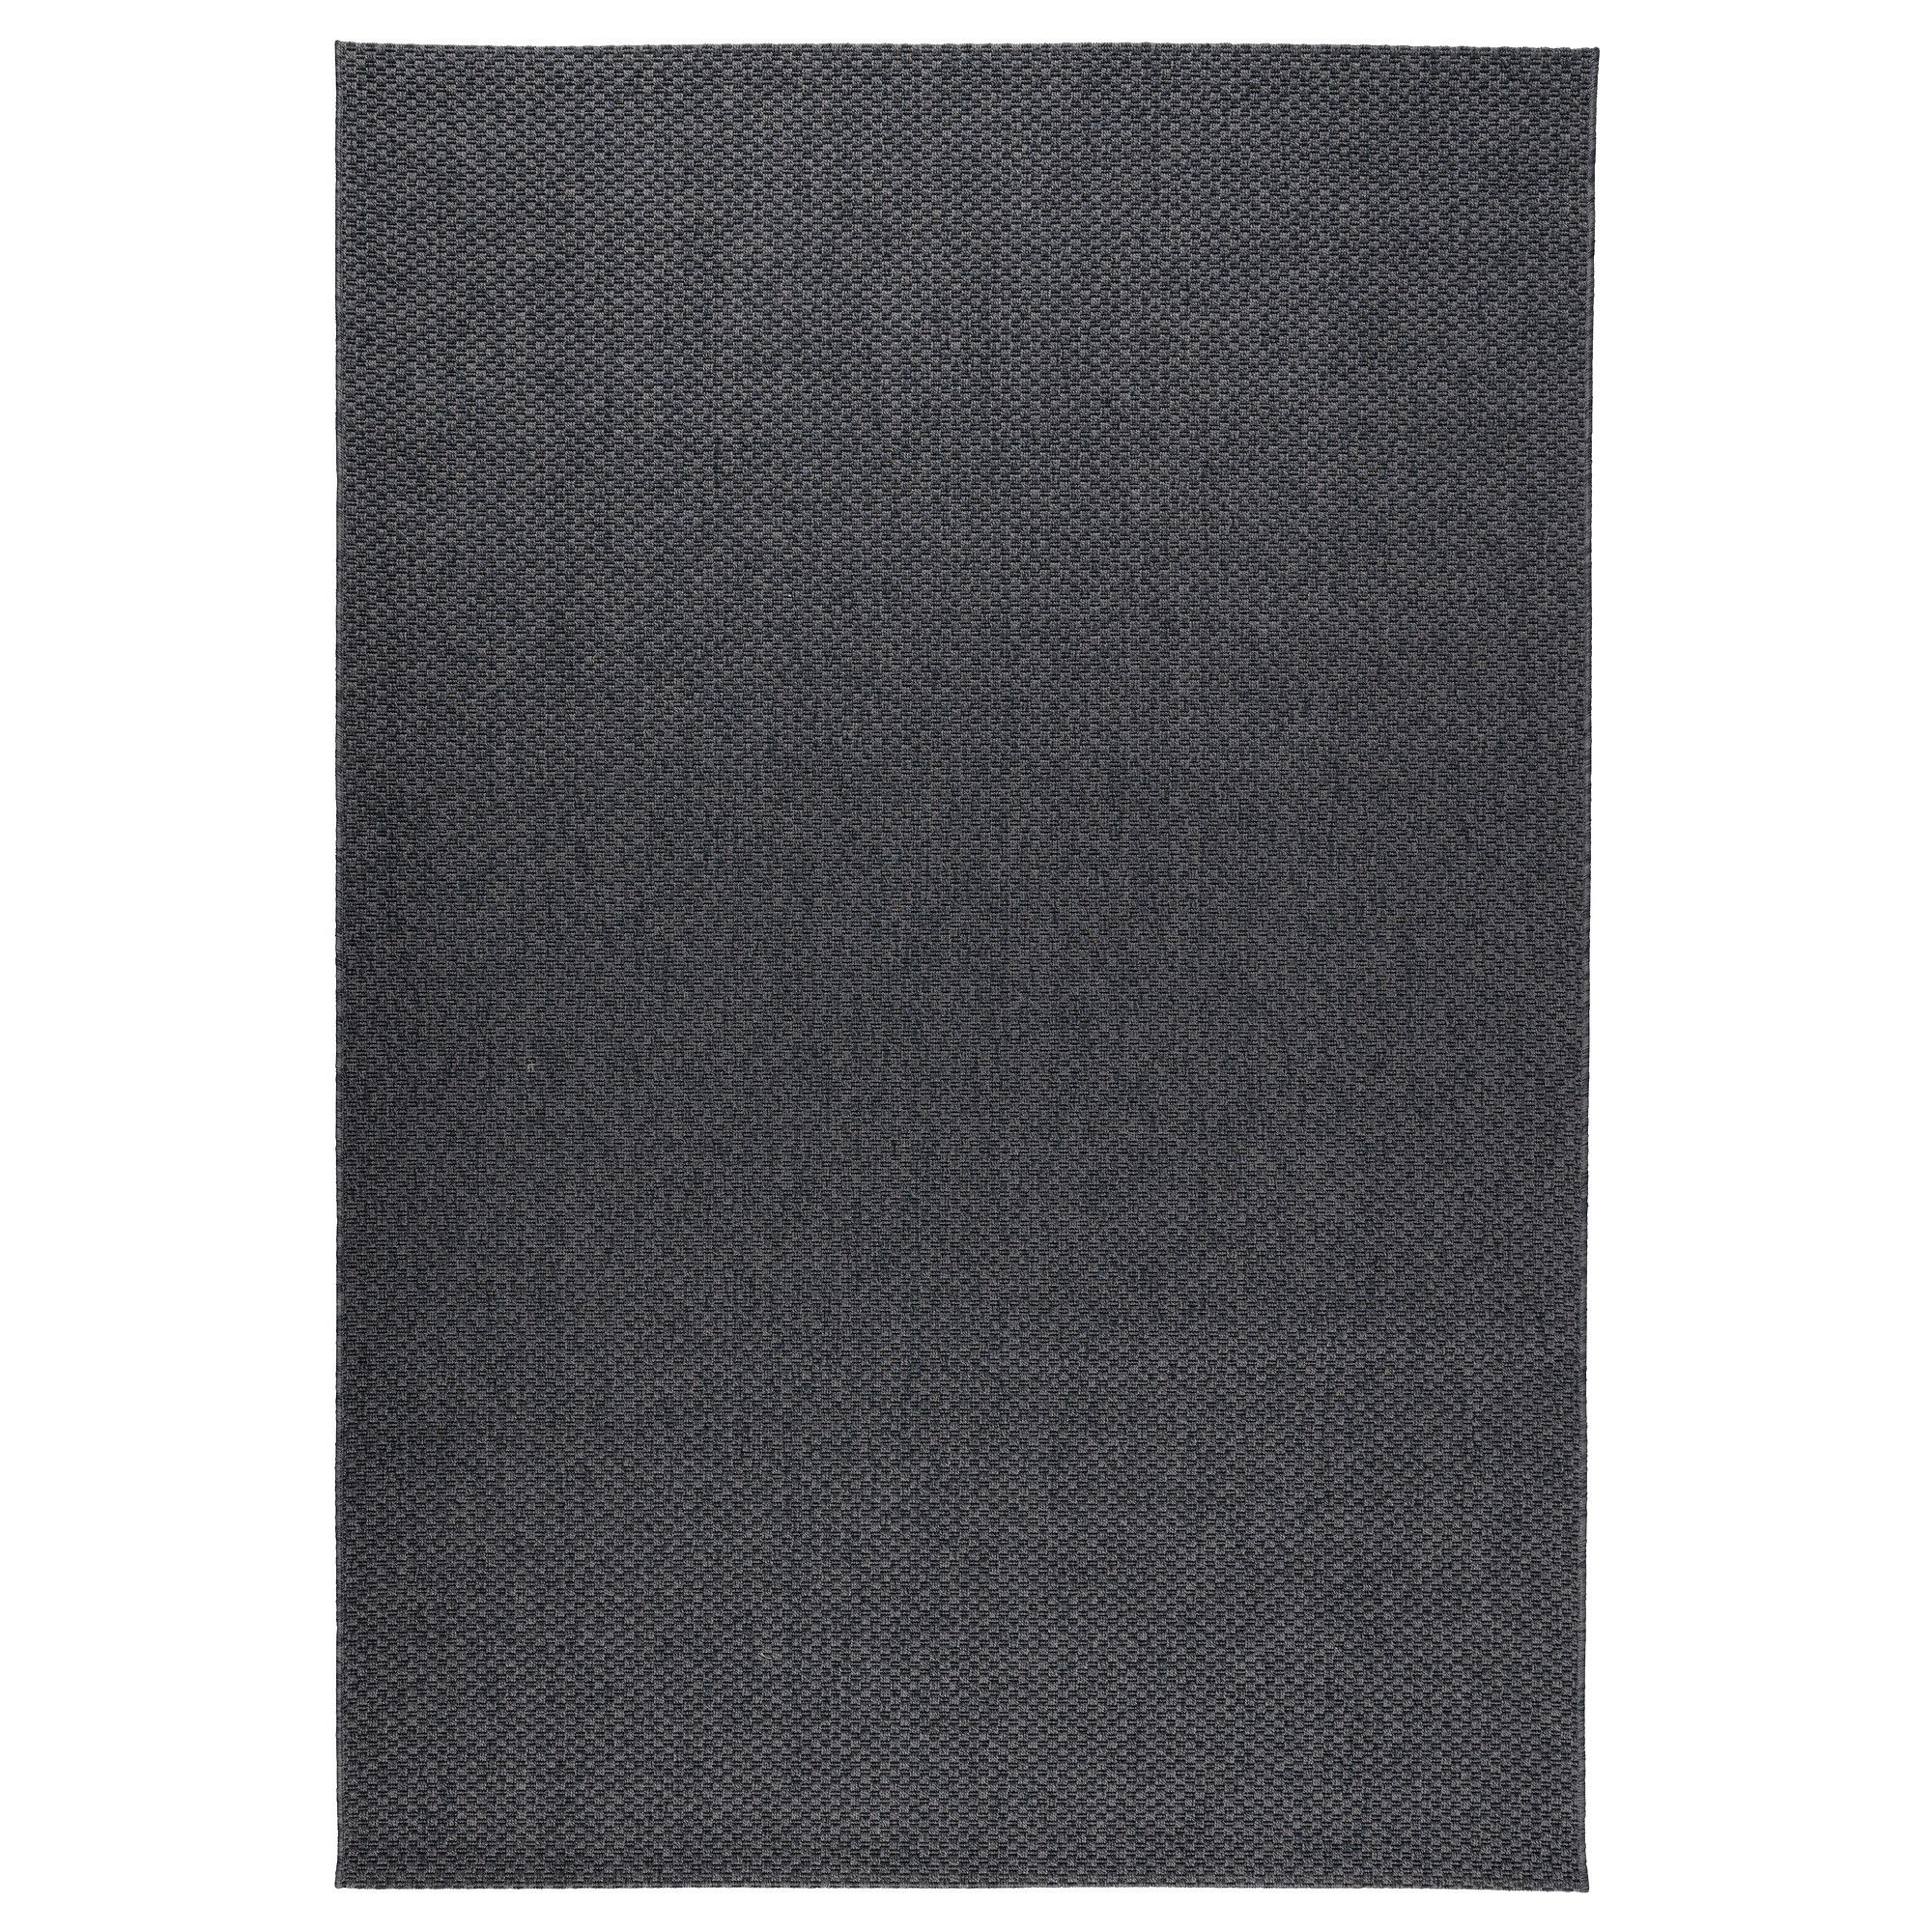 Ikea De Catalog Products 30198293